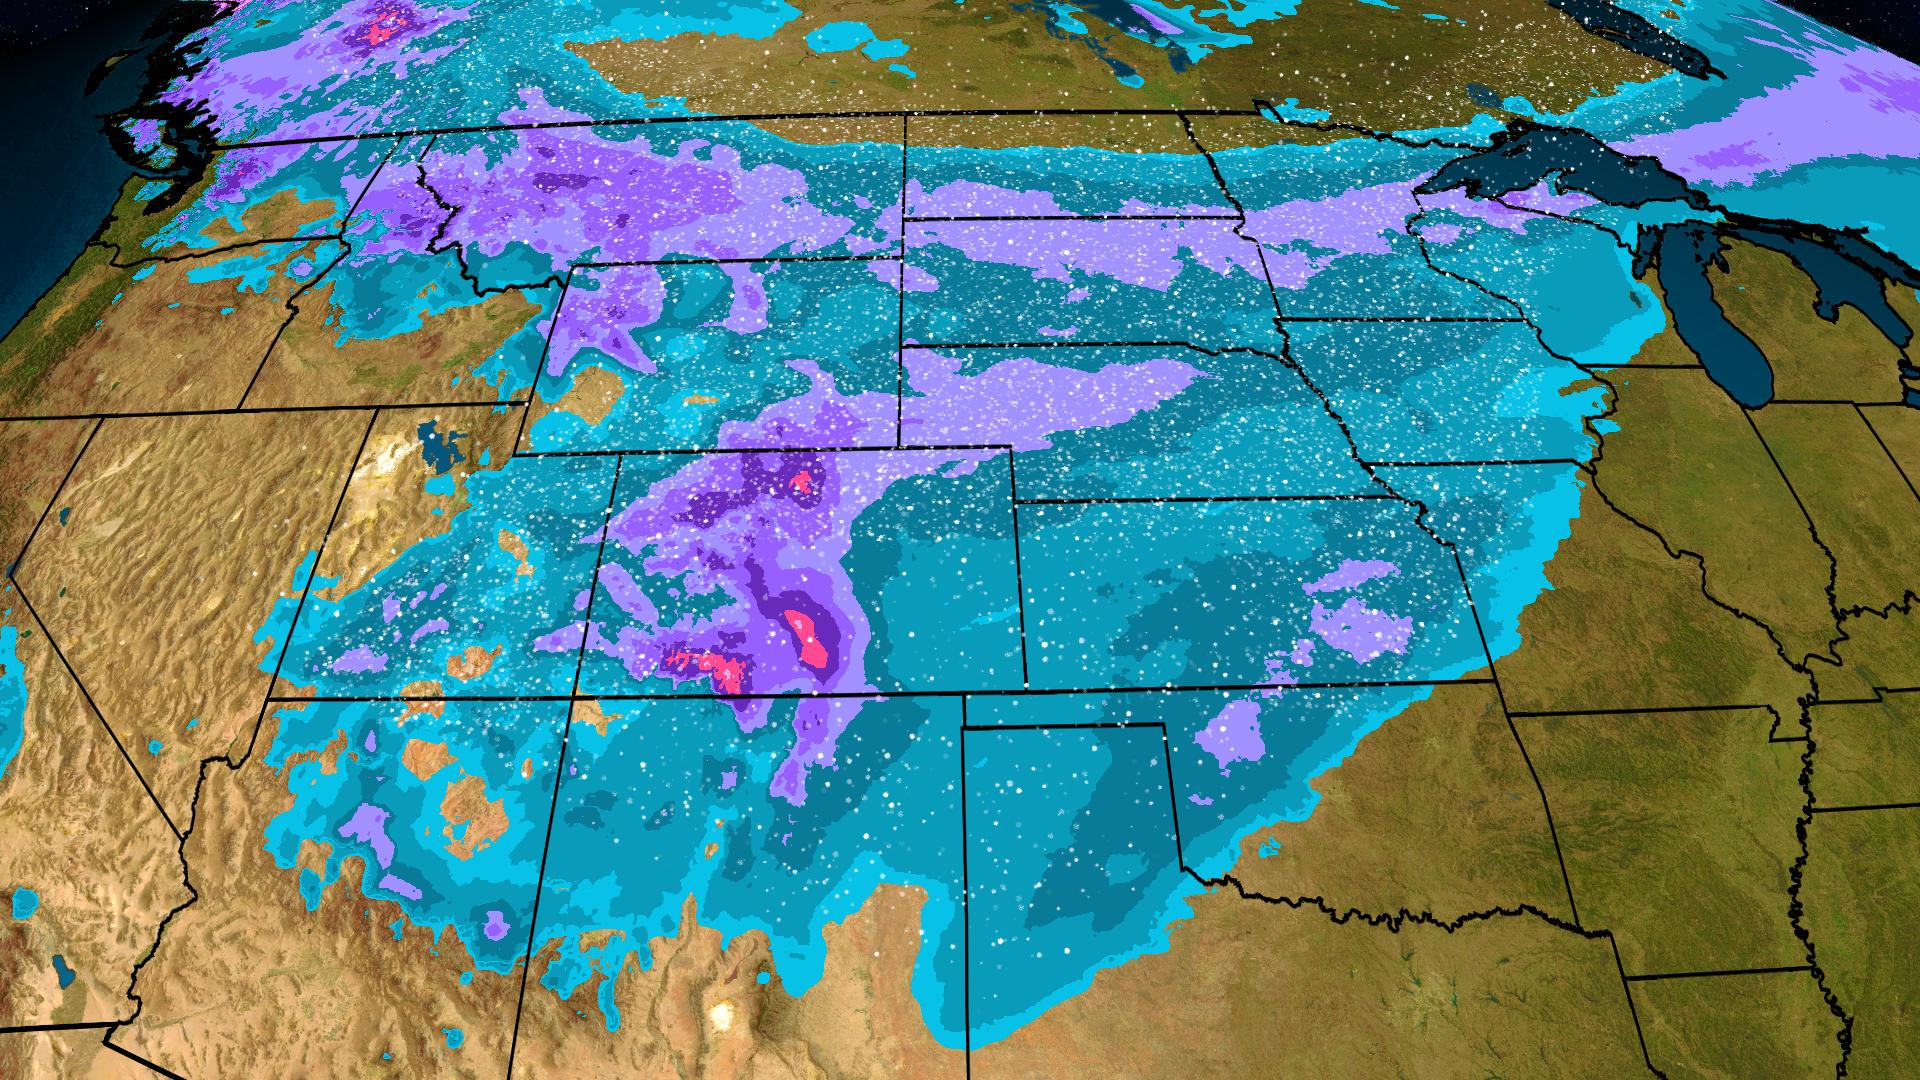 Snow Set to Reach Texas Panhandle